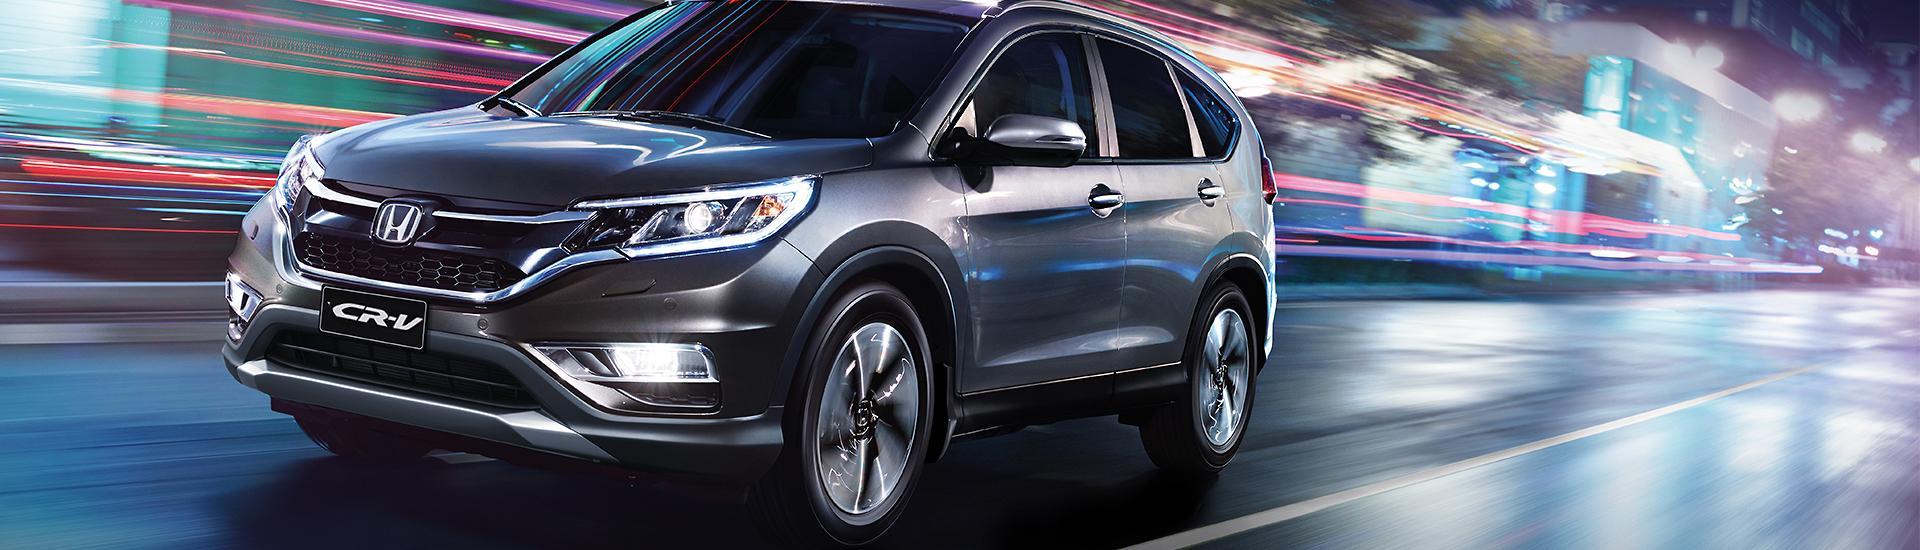 New Honda Cr V Suv Cars For Sale Carsales Com Au